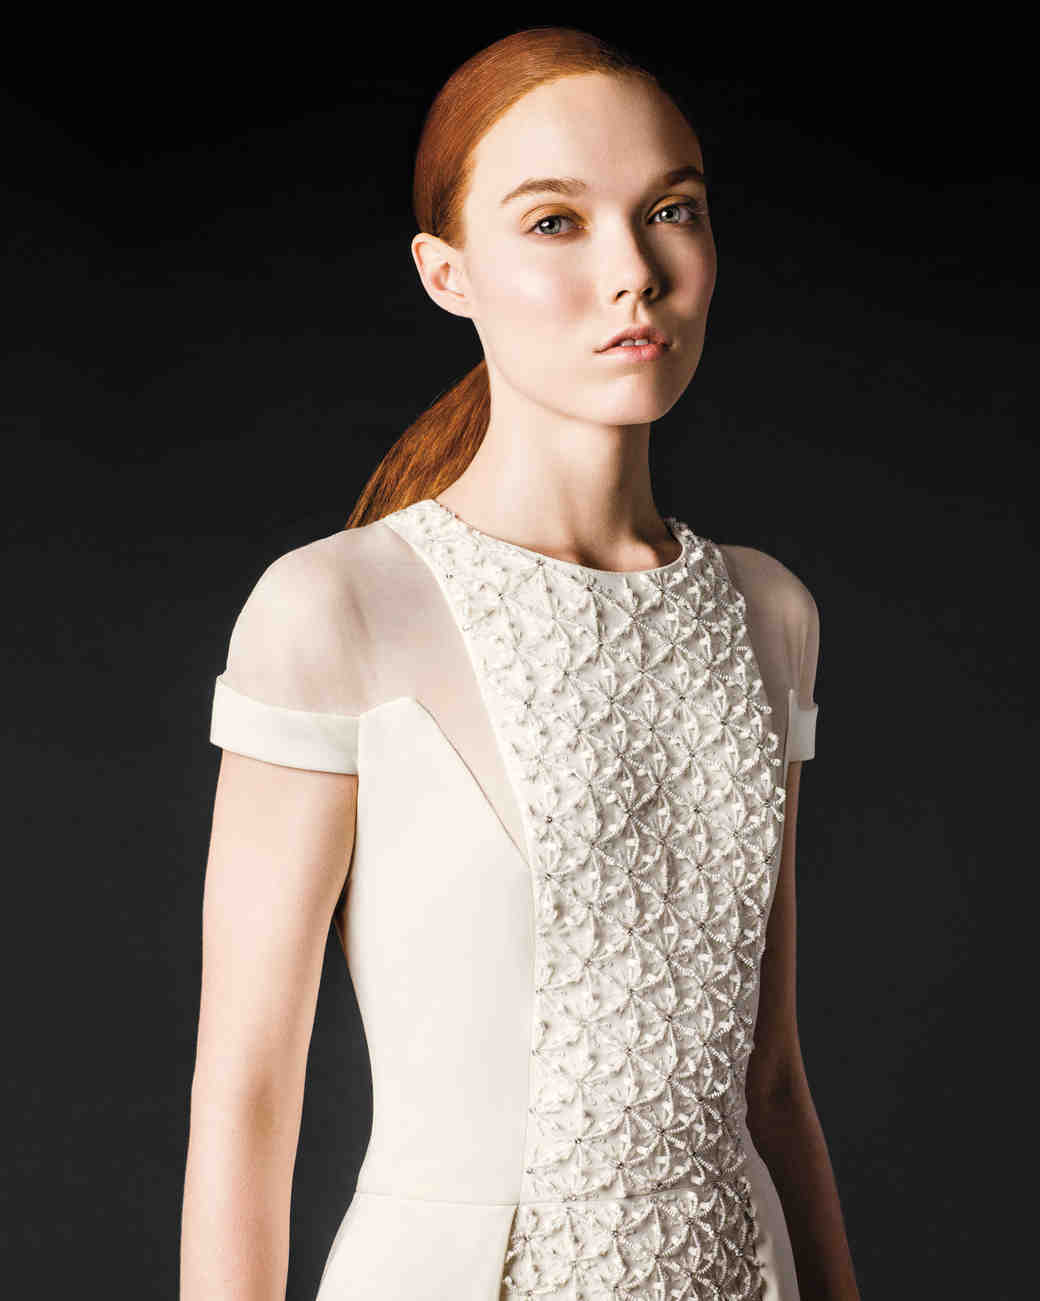 fashion-img-08-d112353.jpg